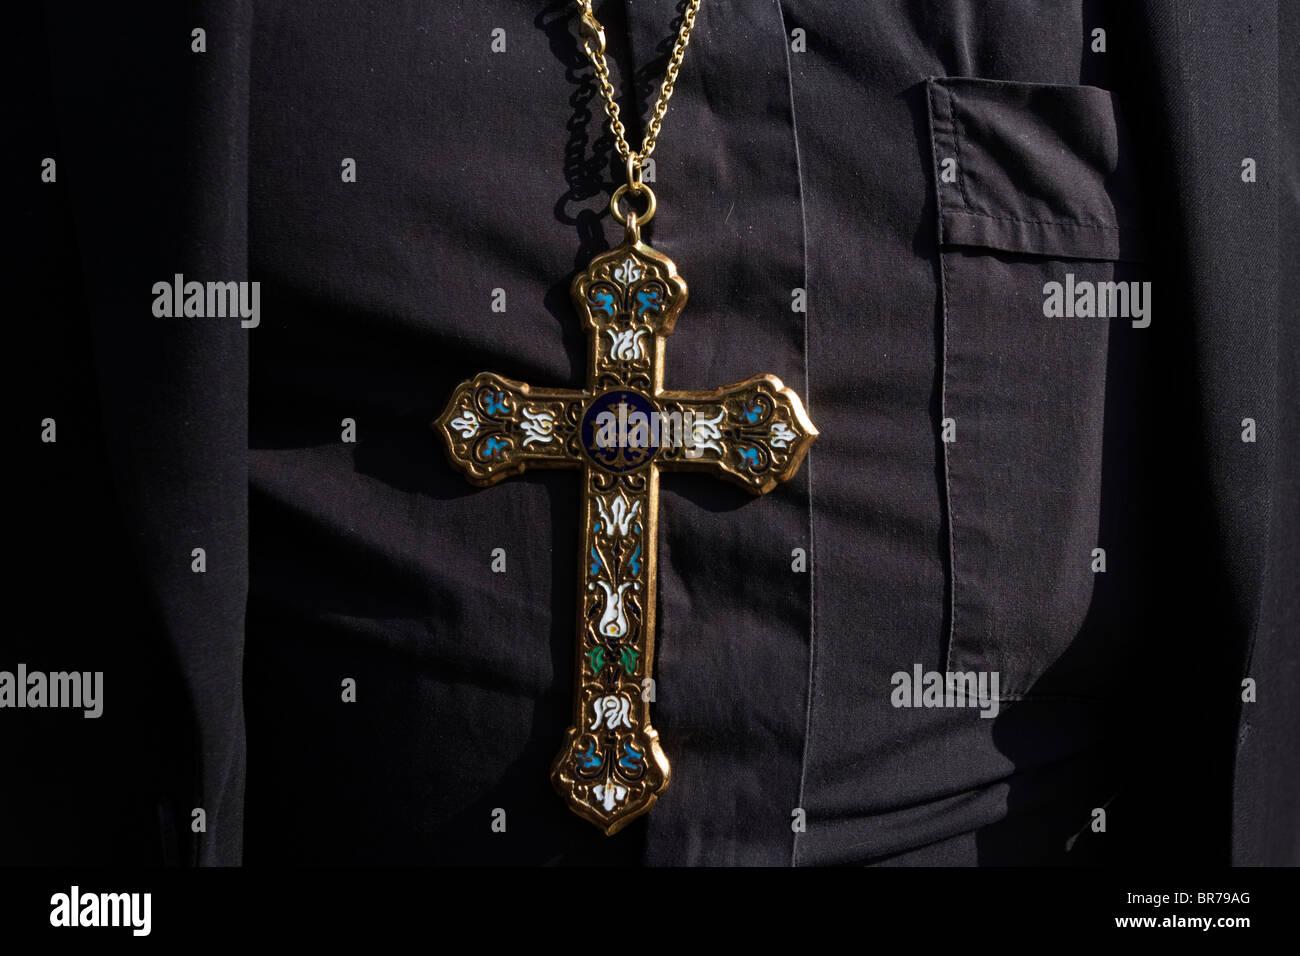 a-pectoral-crucifix-cross-worn-by-an-ano